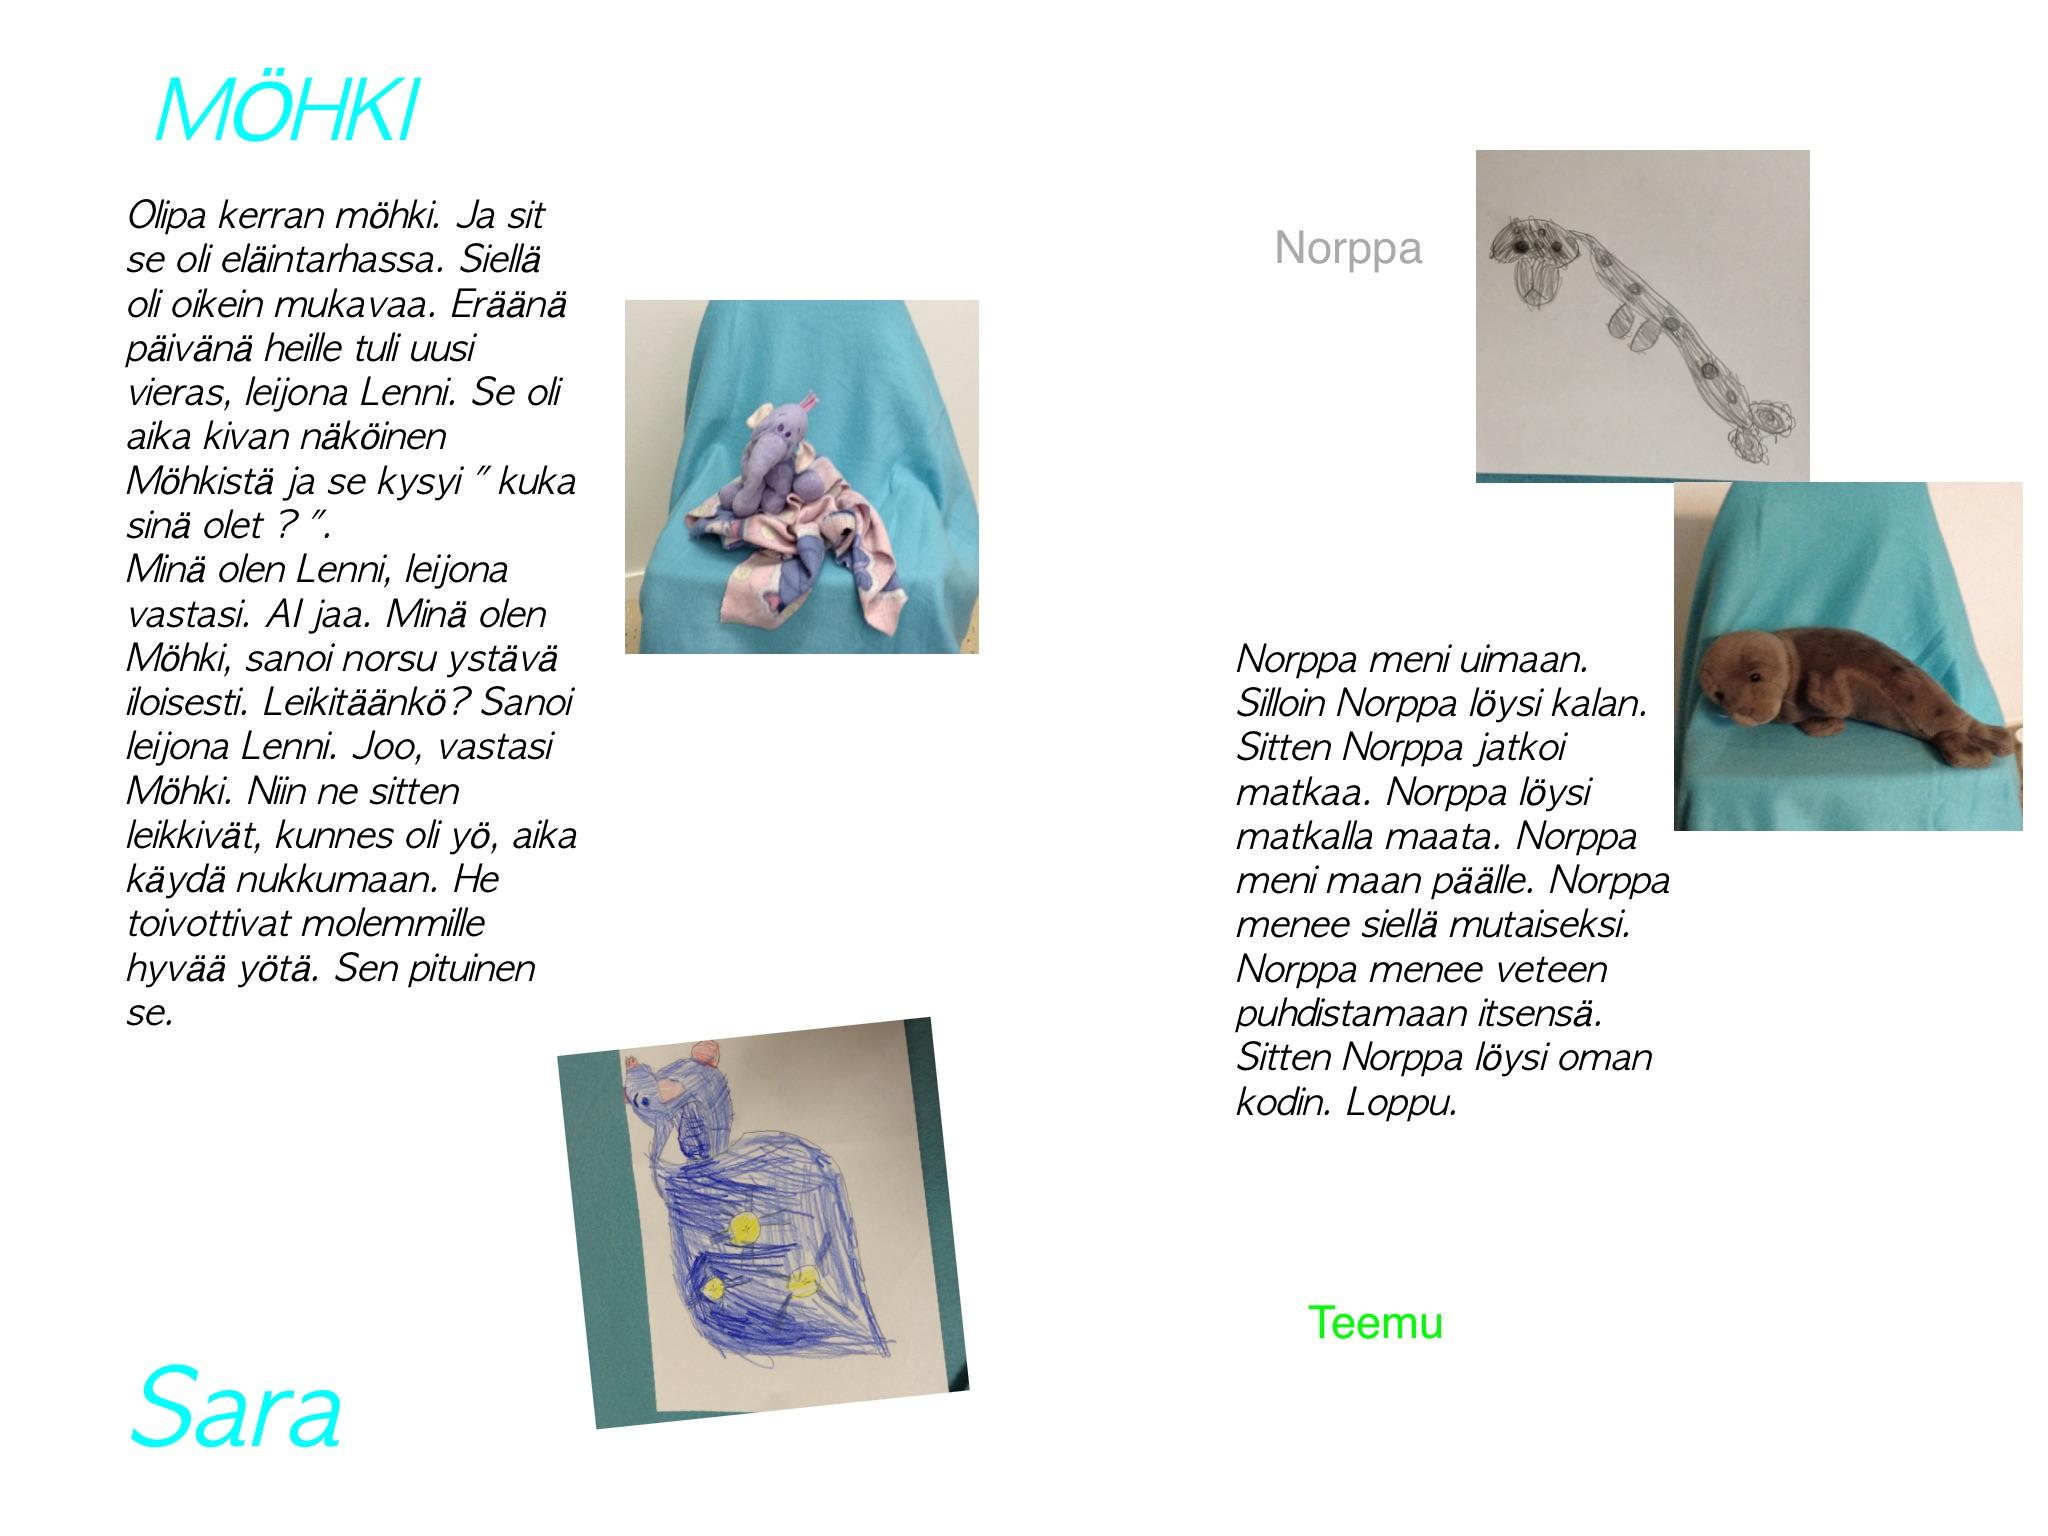 image_6.jpg